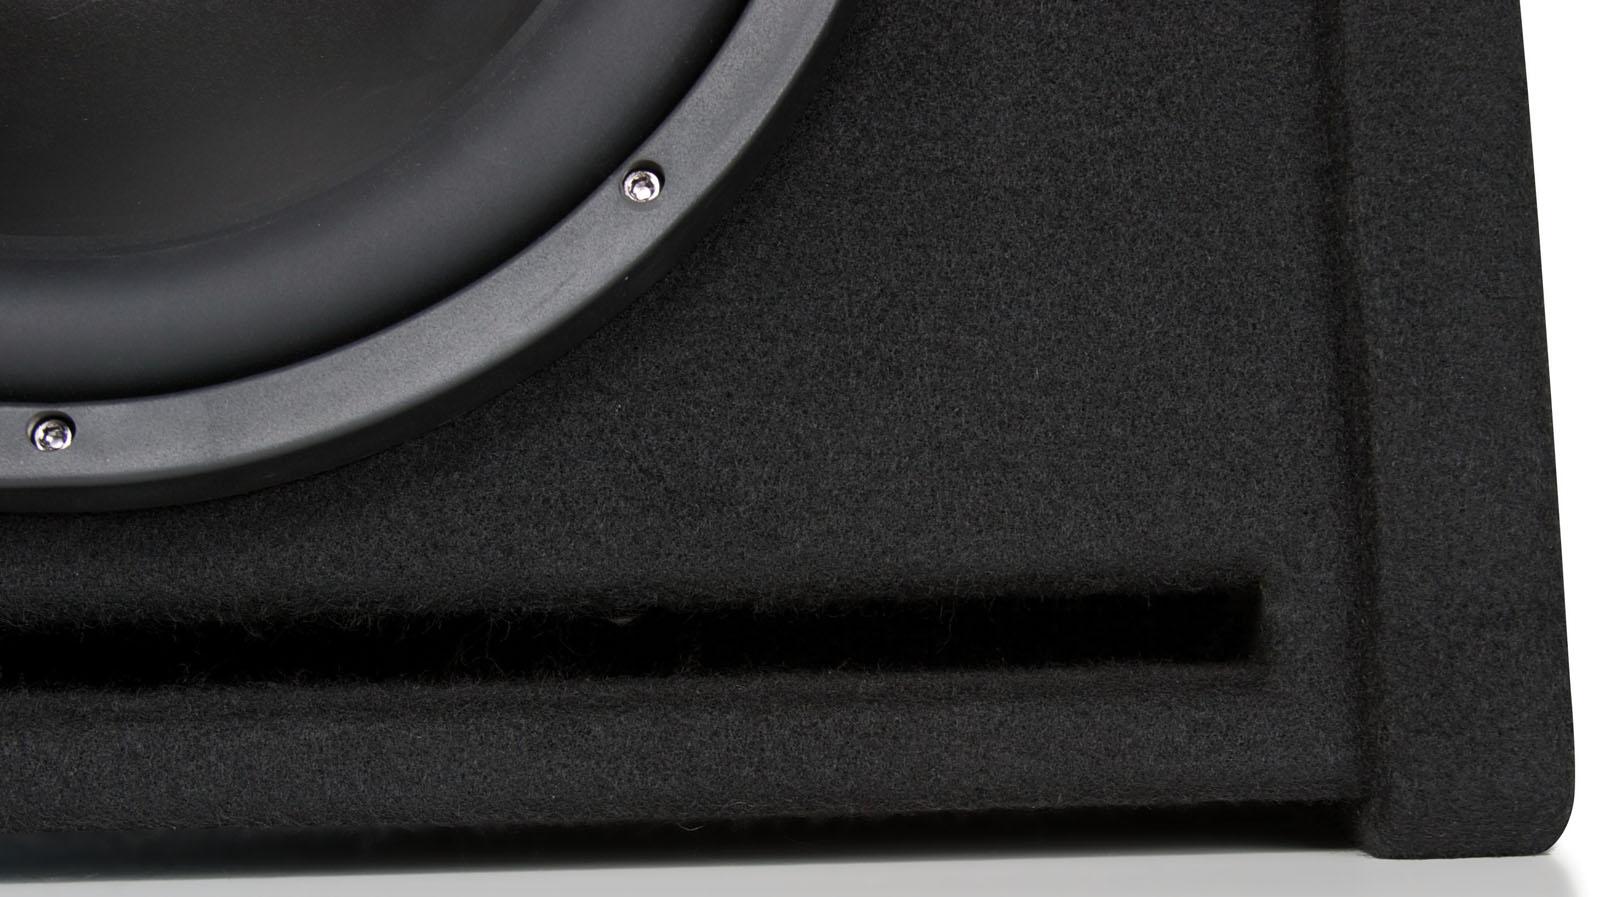 Tnp112d Mtx Car Subwoofer Enclosure And Amplifier Mtx